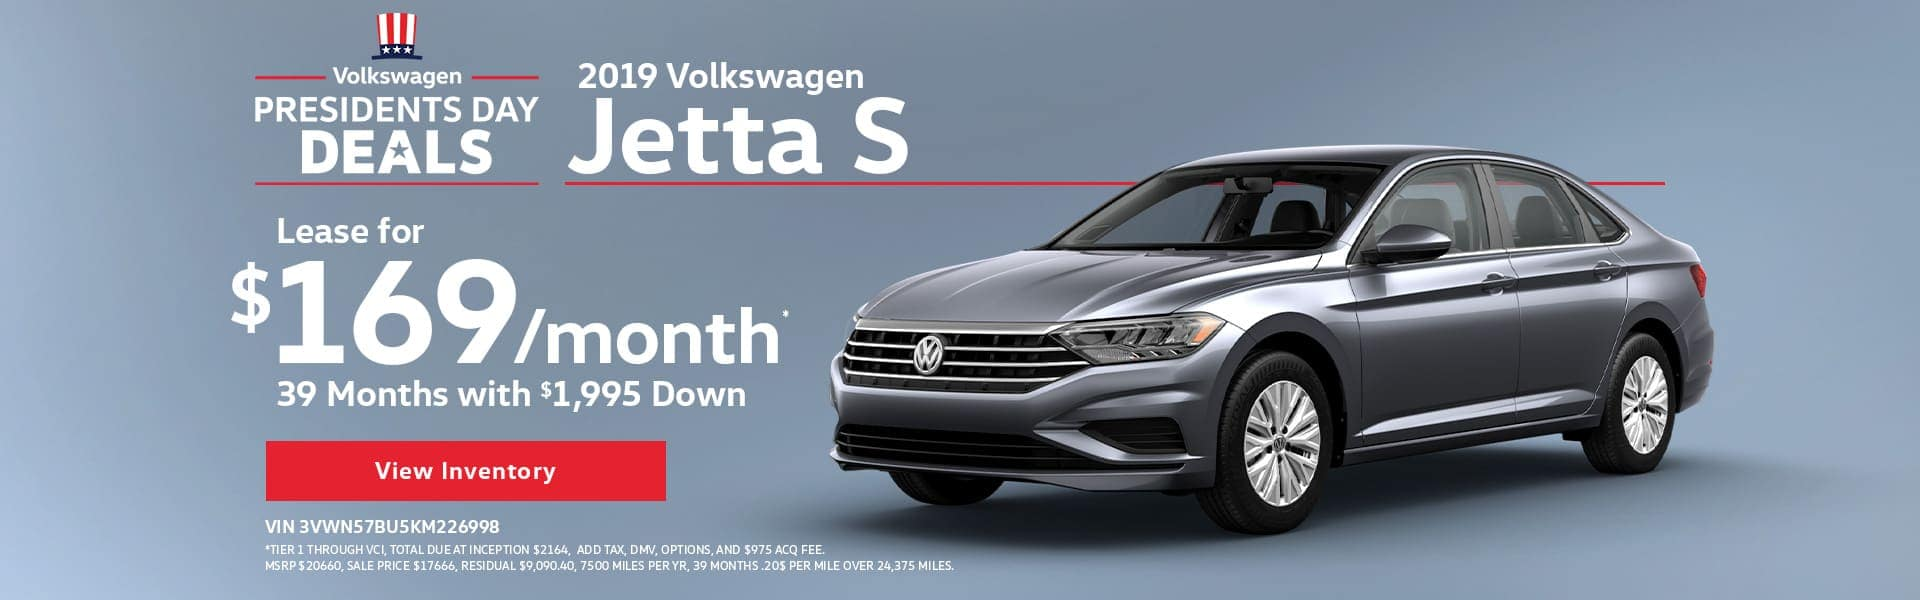 Presidents Day Deals - 2019 Volkswagen Jetta S